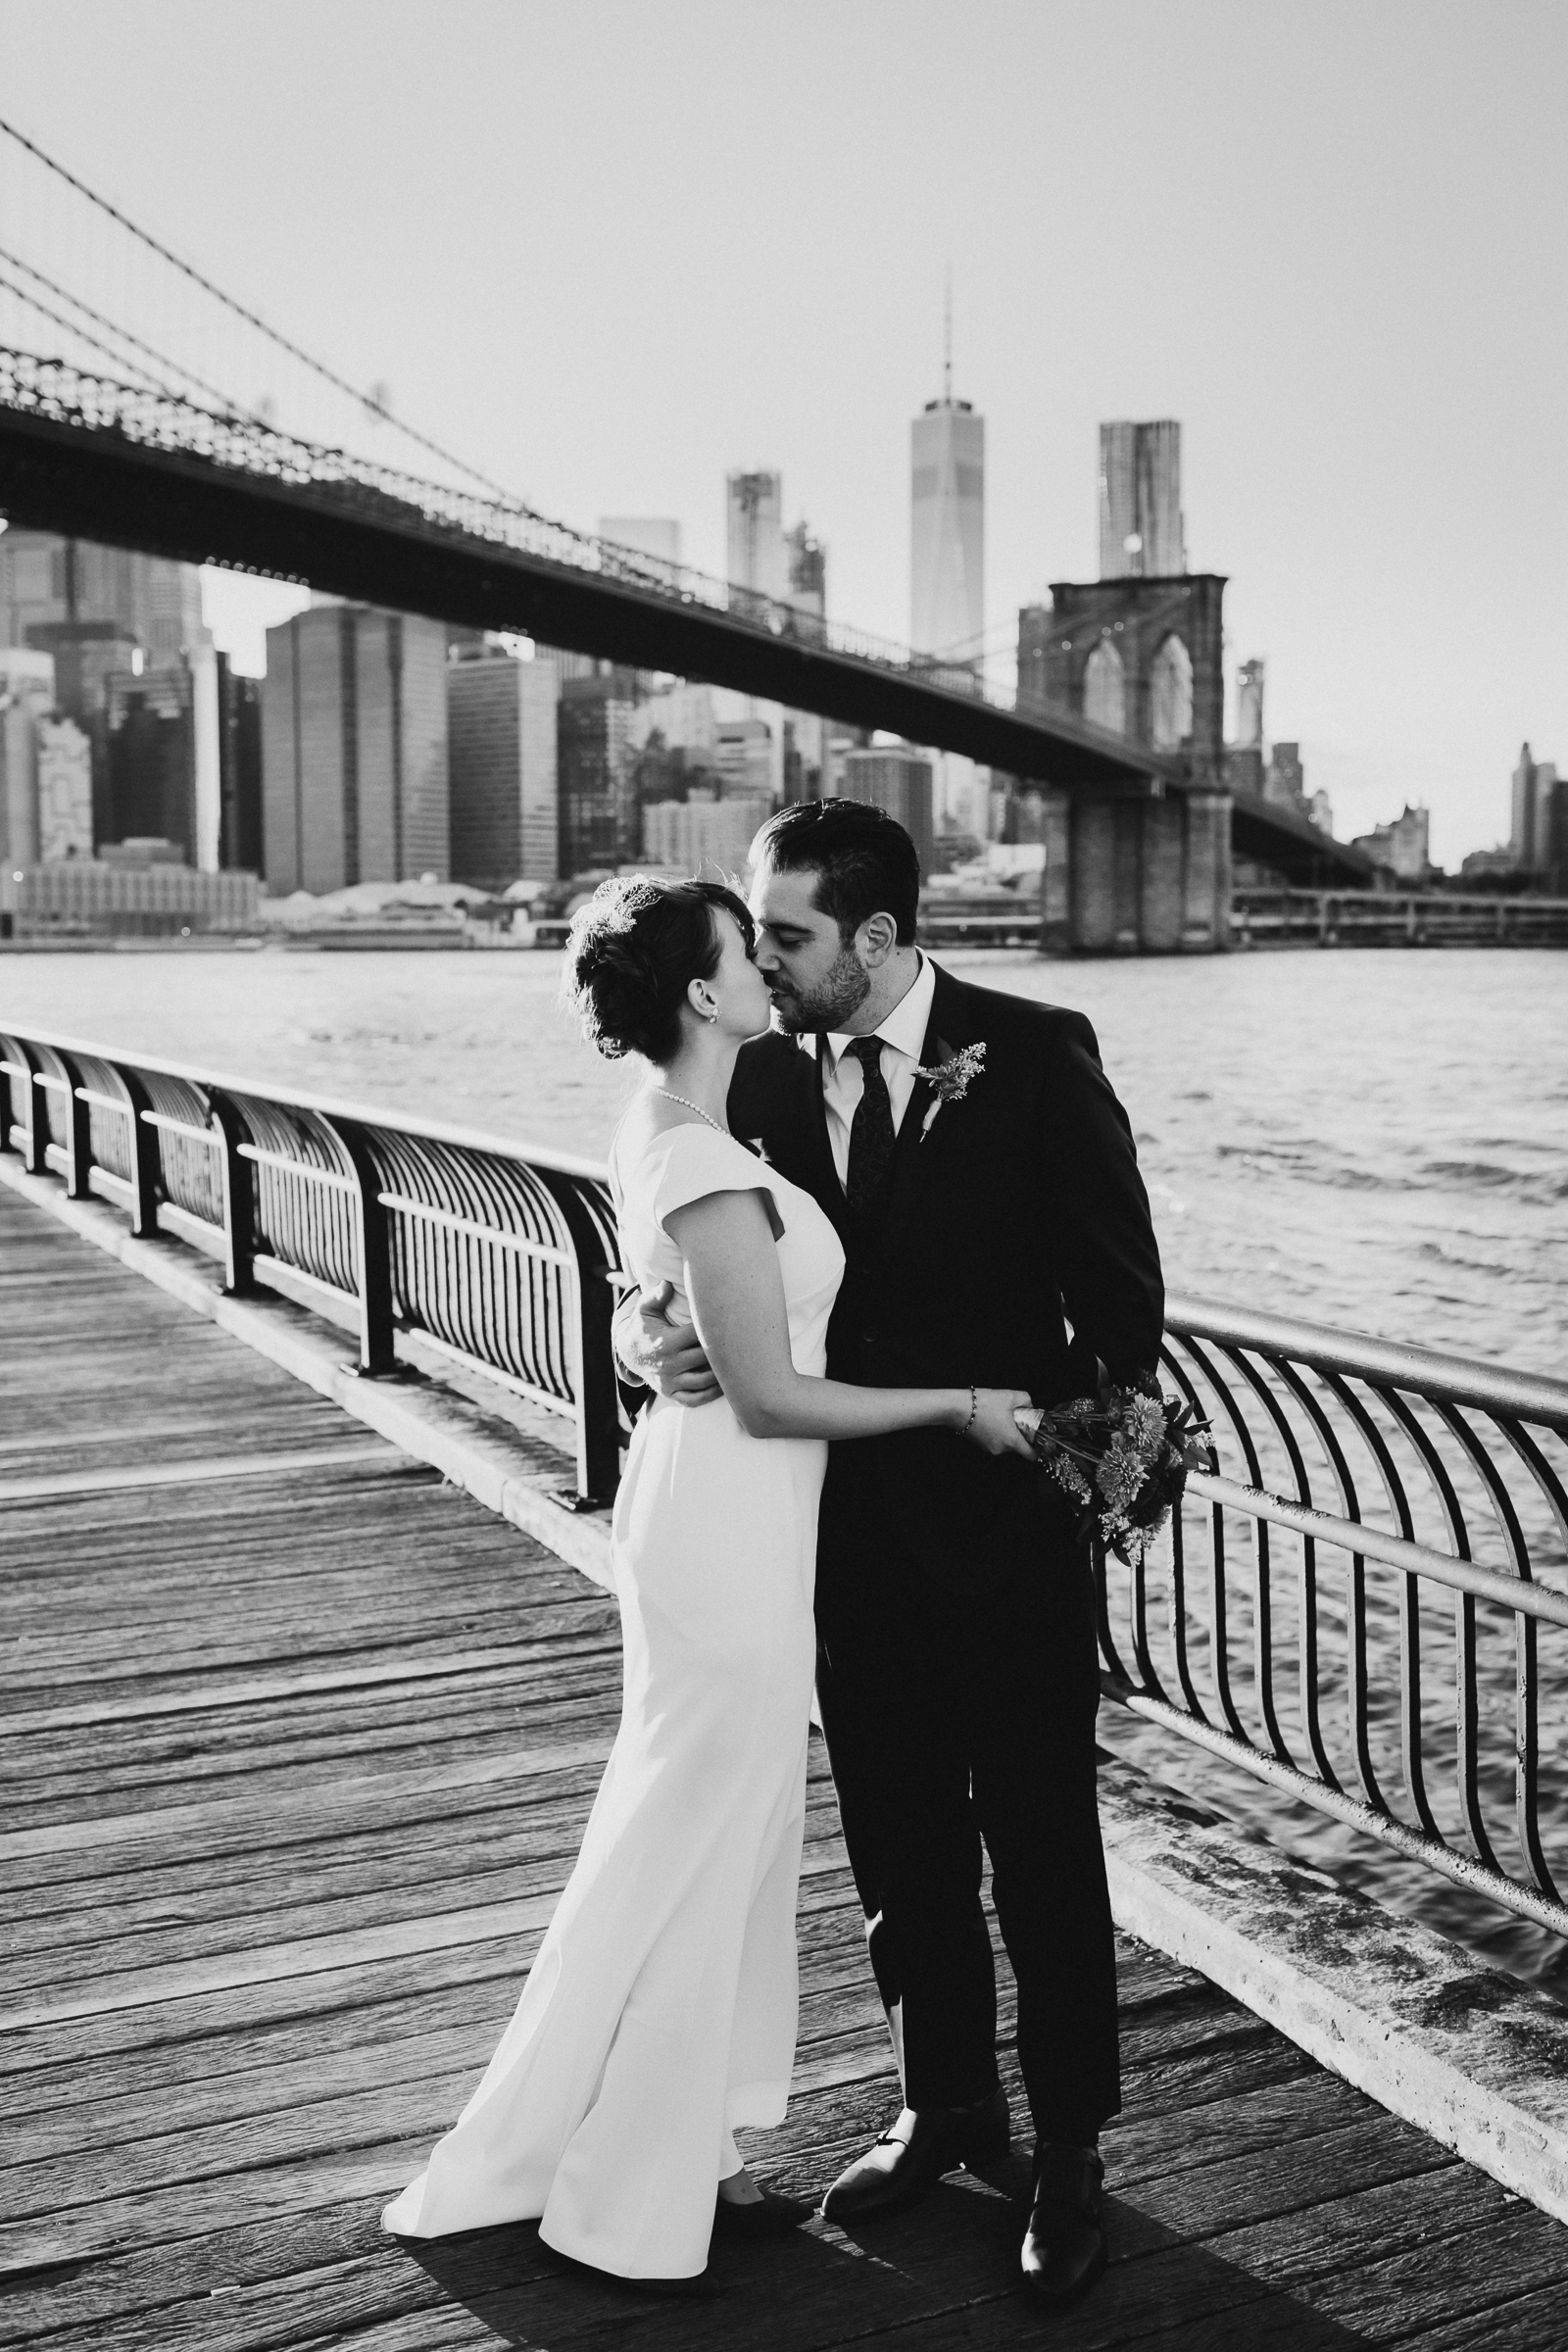 Dumbo-Brooklyn-Bridge-Park-NYC-Elopement-Documentary-Photographer-35.jpg